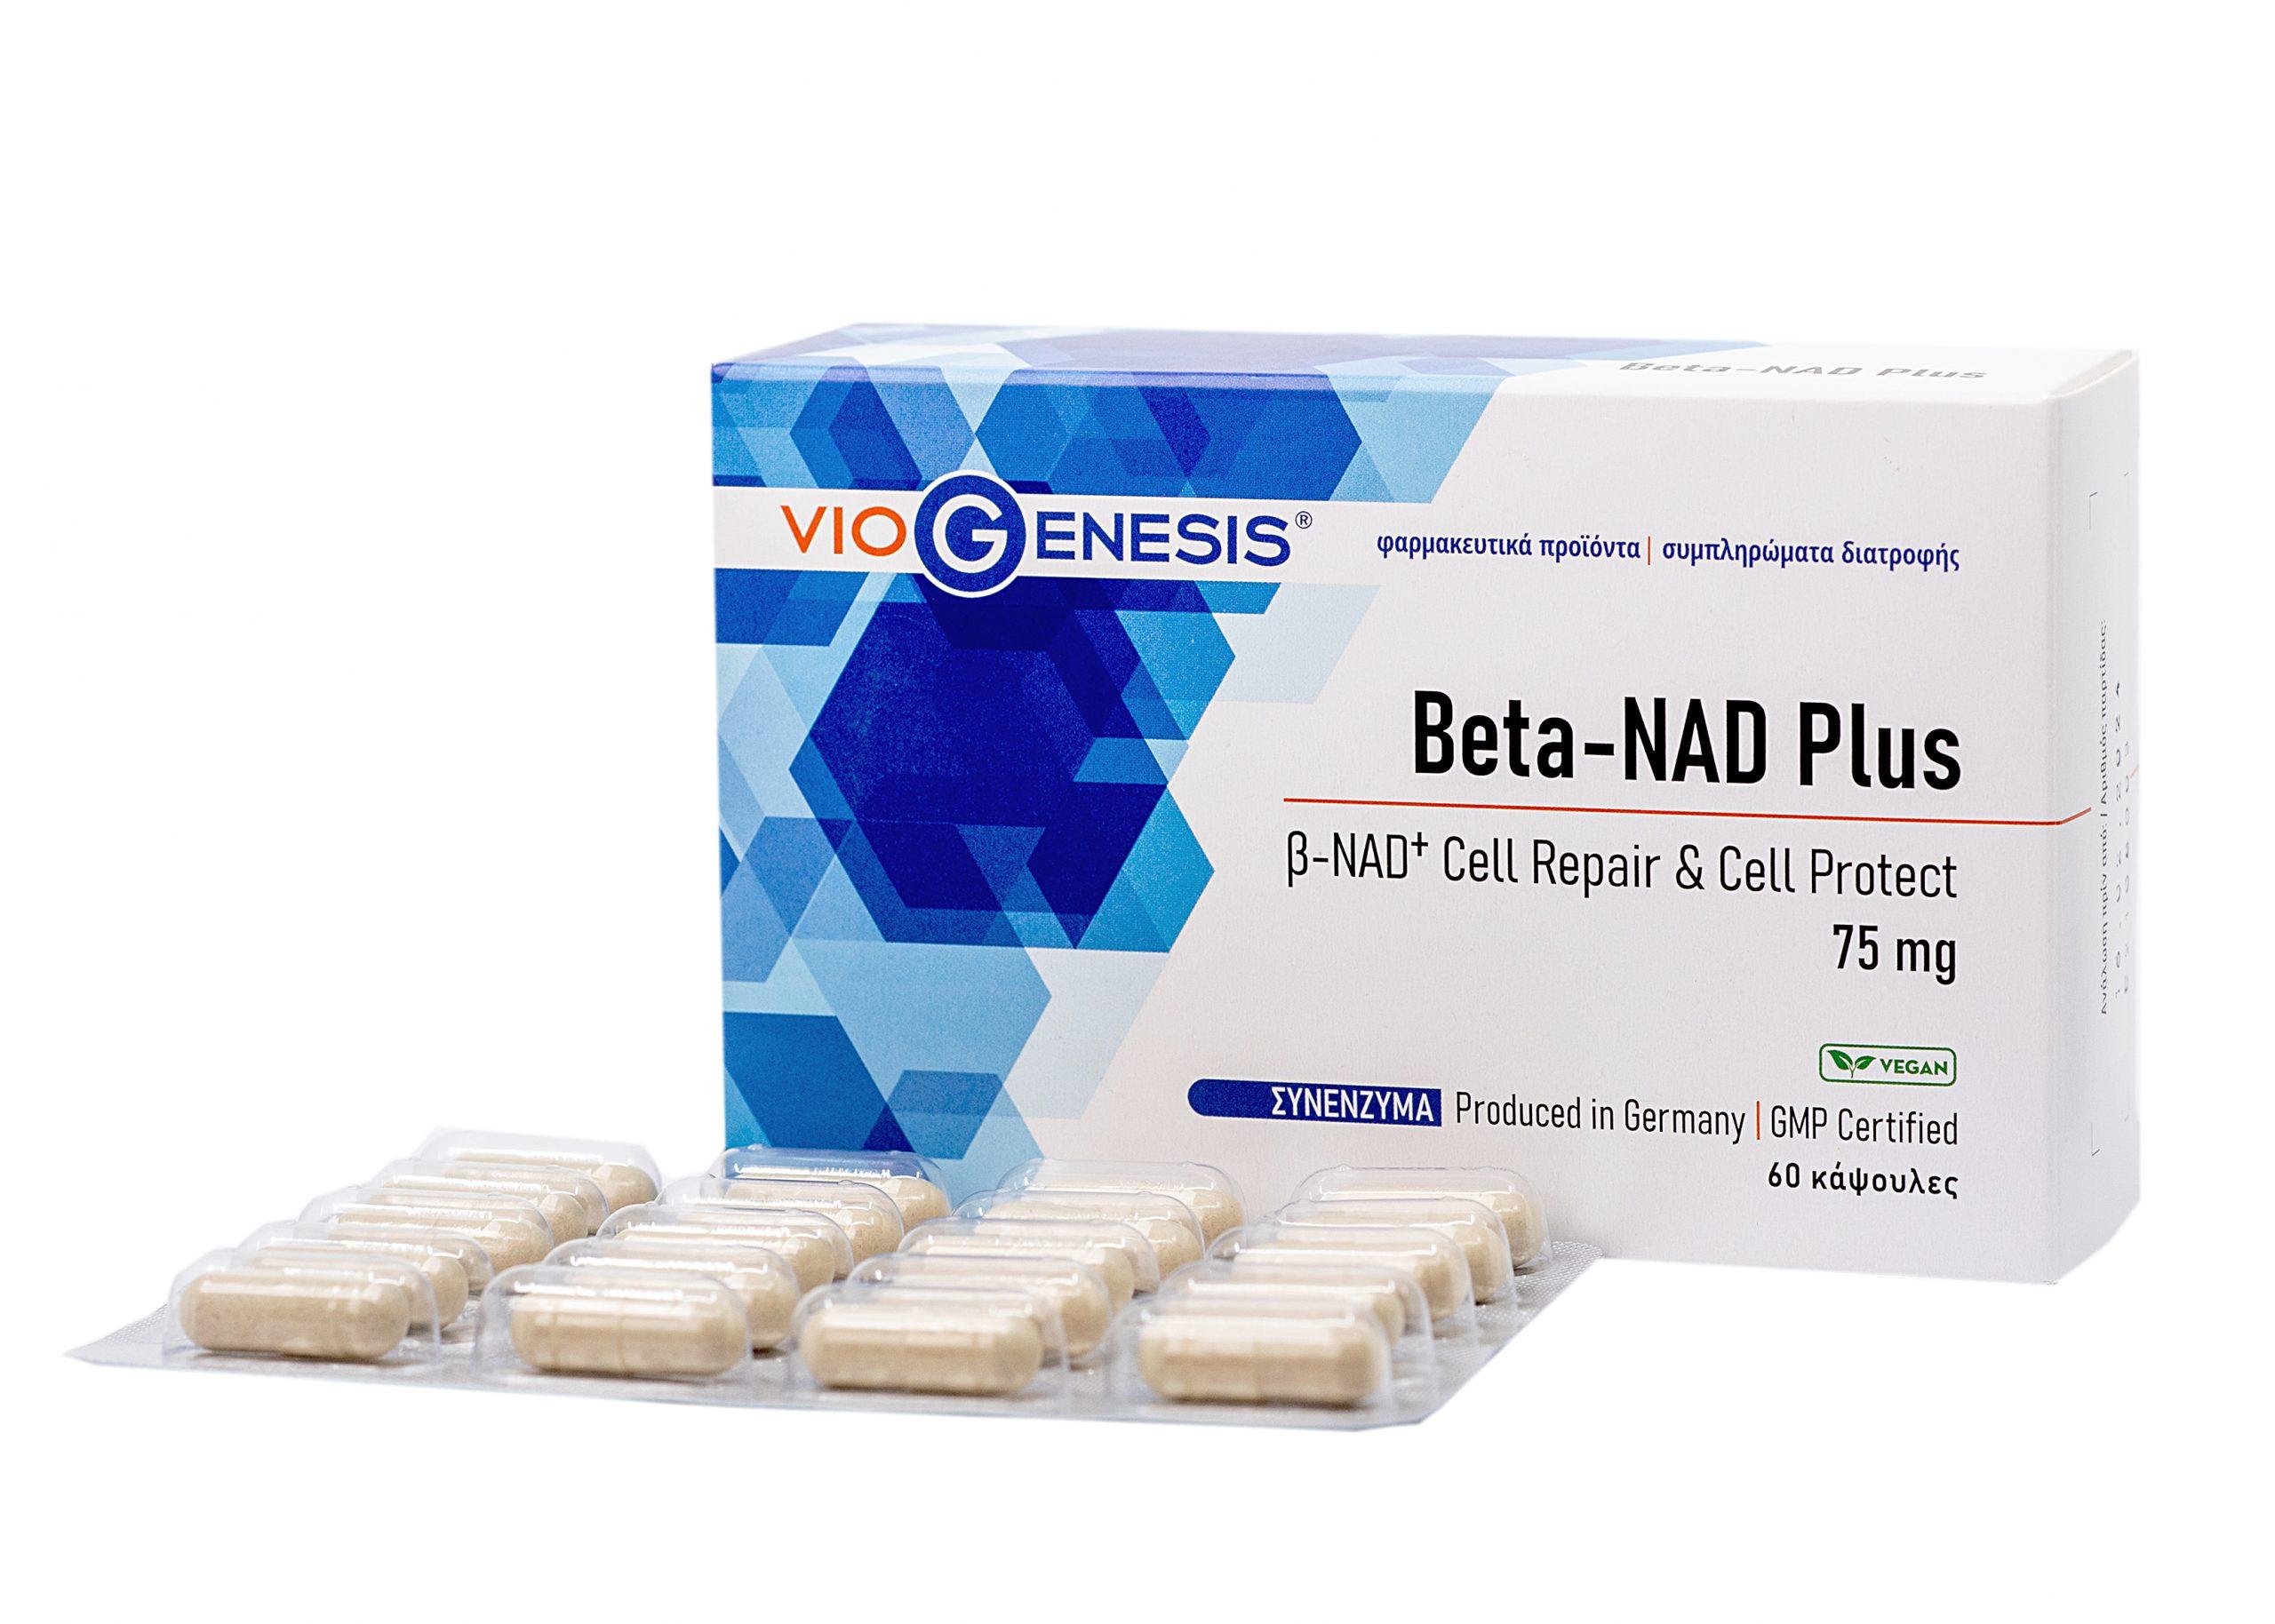 VioGenesis-Beta-NAD-Plus-30-caps-box-2